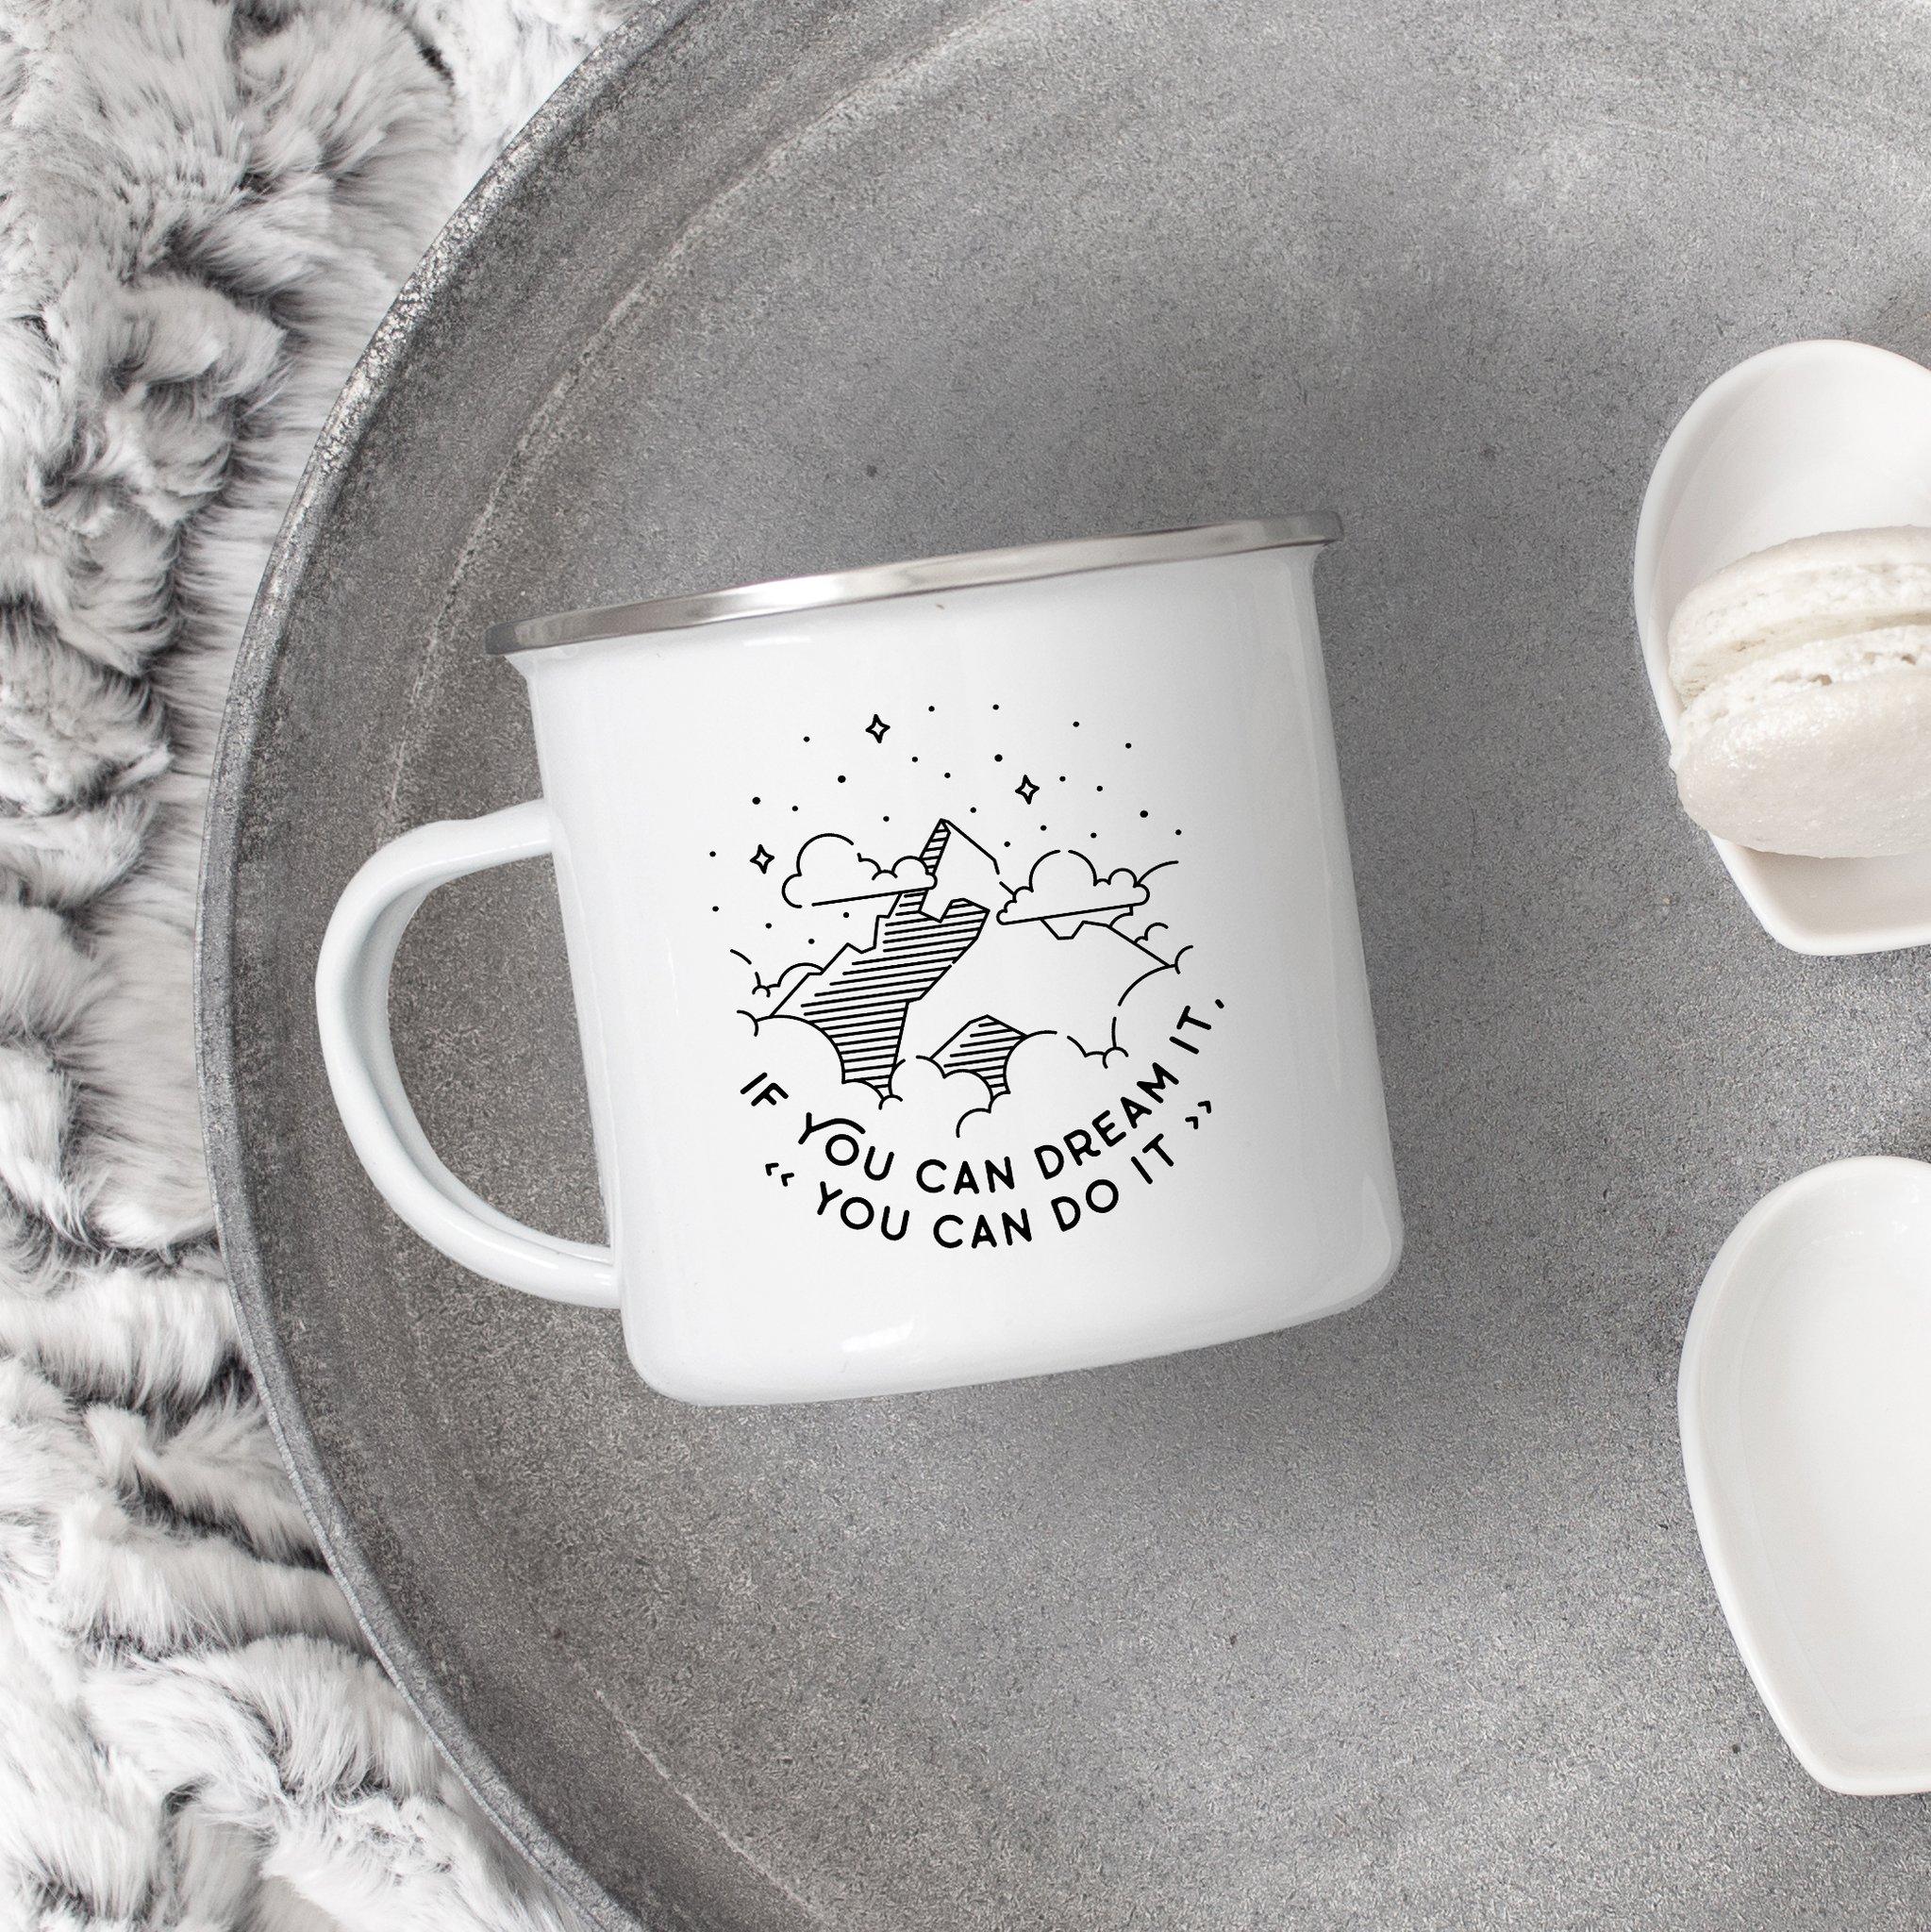 Sovende Bjorn Enamel Mug - If you can dream